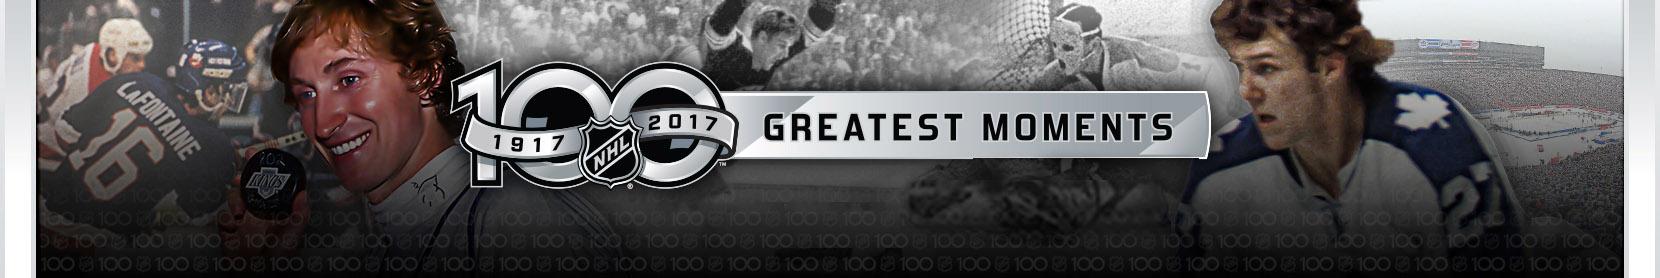 NHL Greatest Moments Bracket Challenge